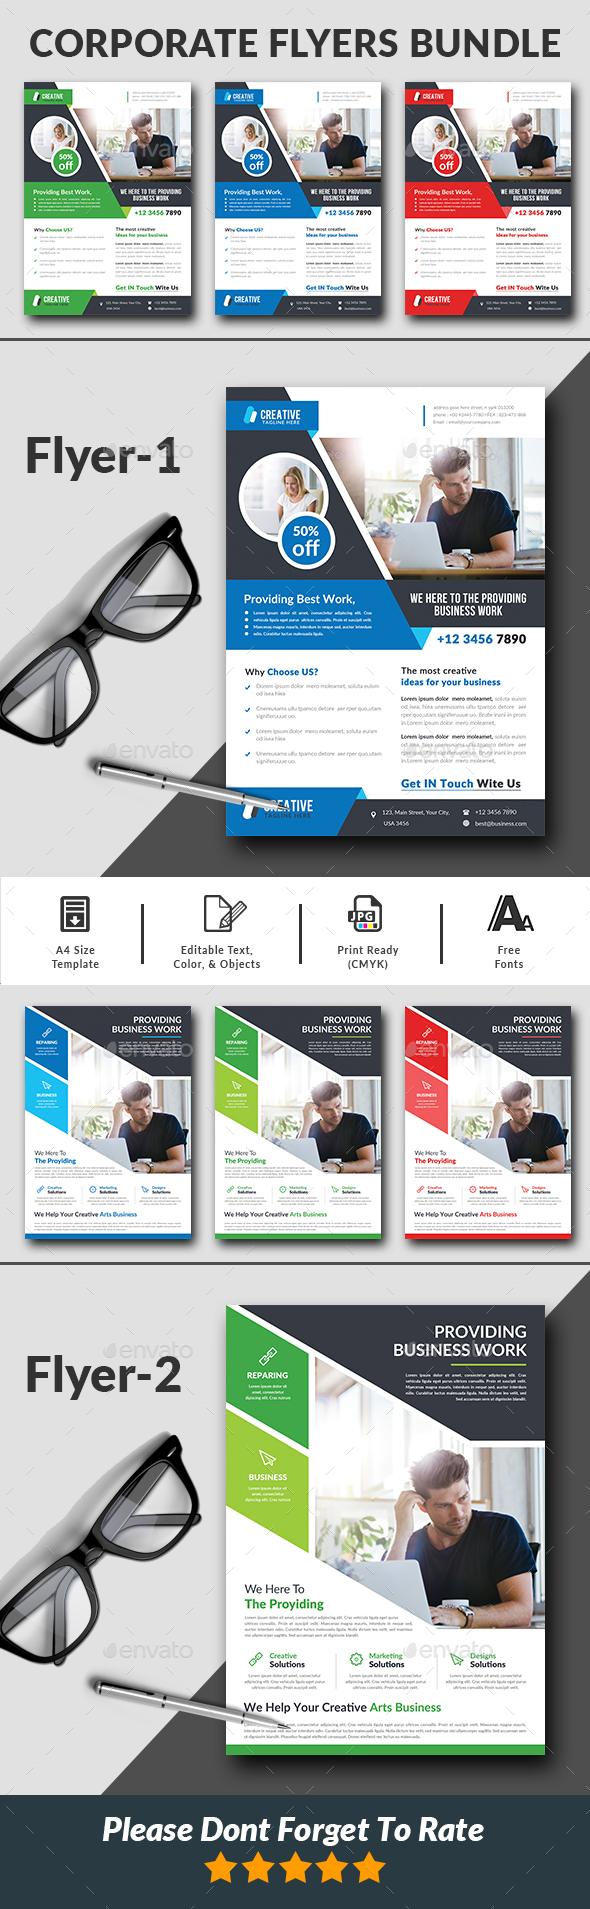 Corporate Business Flyers Bundle - Corporate Flyers